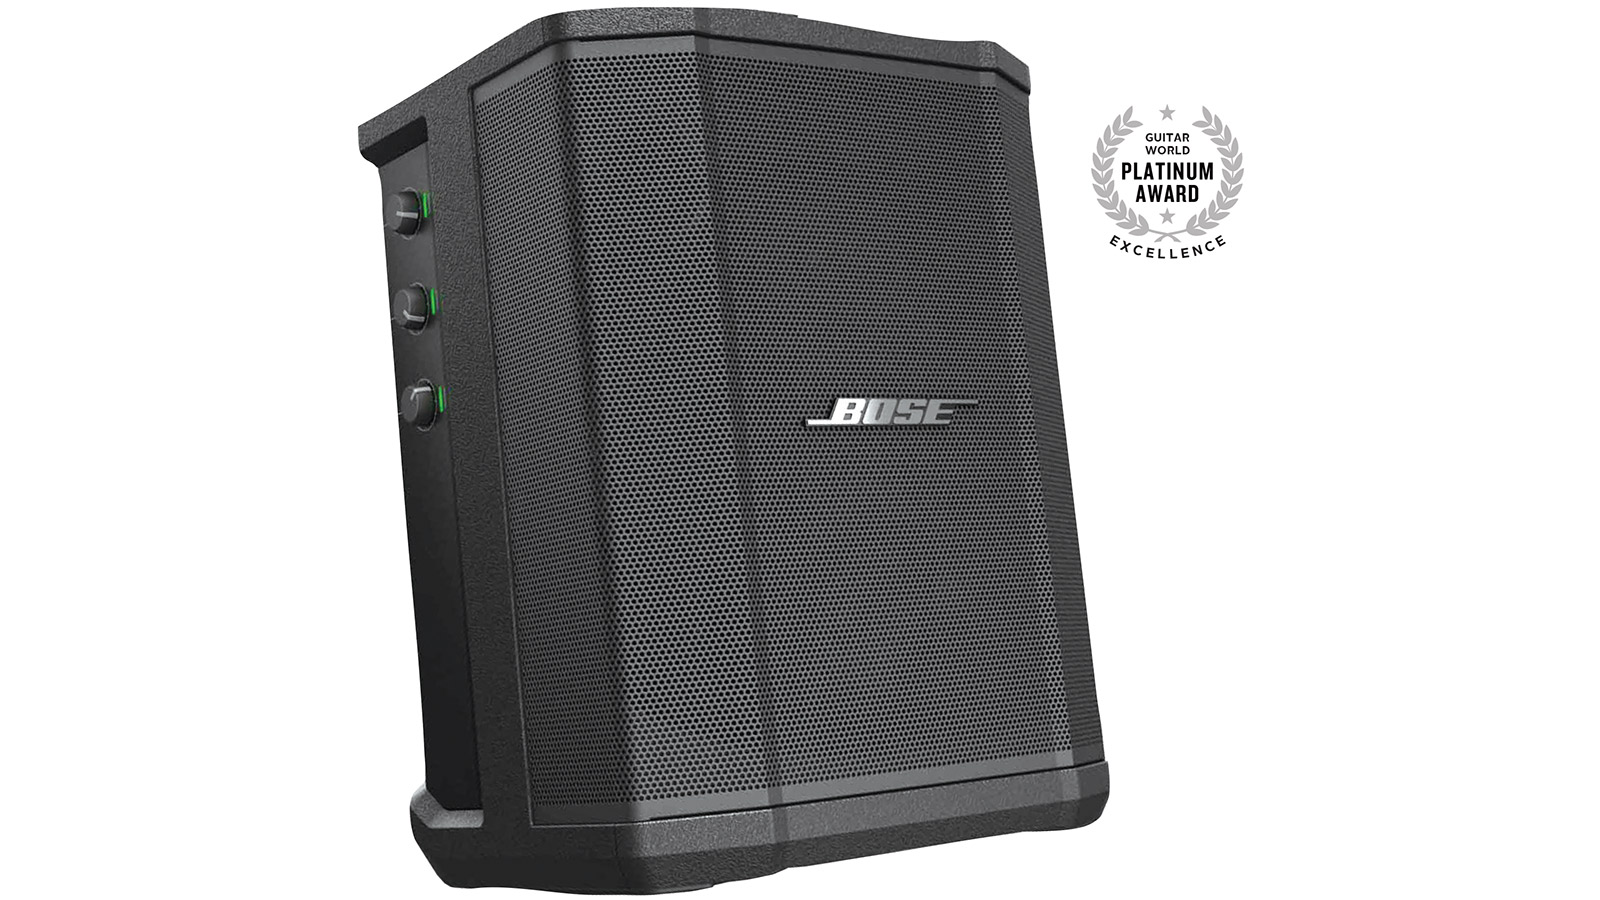 Review: Bose S1 Pro | Guitarworld